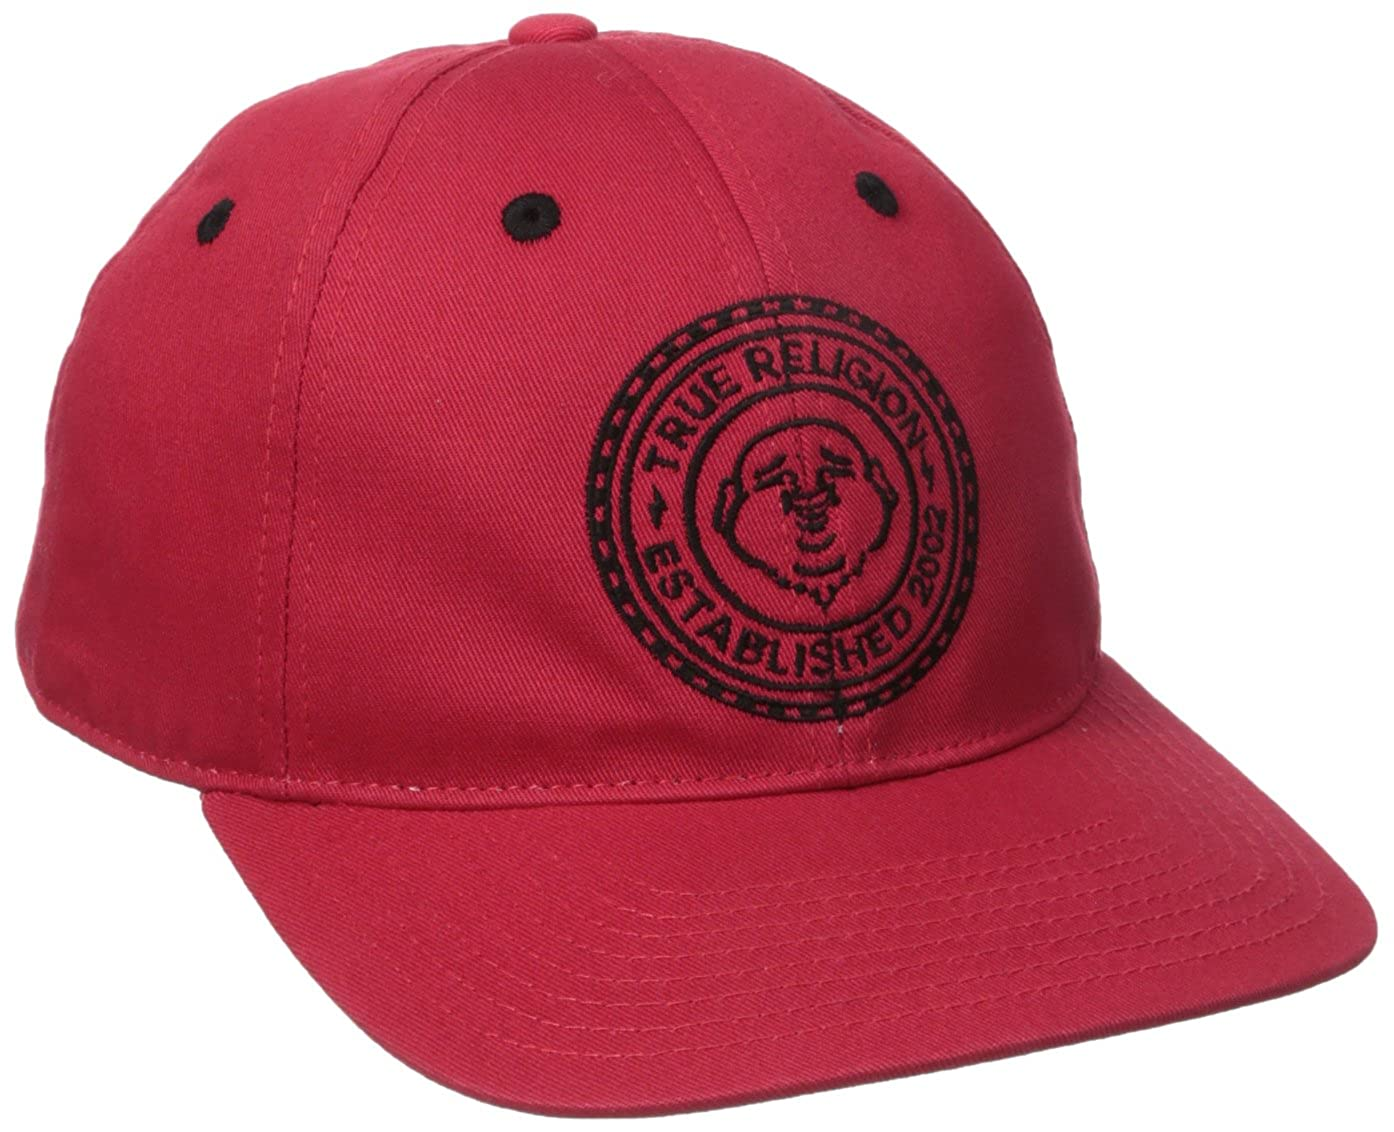 96c362a02e488 True Religion Mens Buddha Seal Flat Brim Cap True Red One Size True  Religion Headwear TR2274 ...